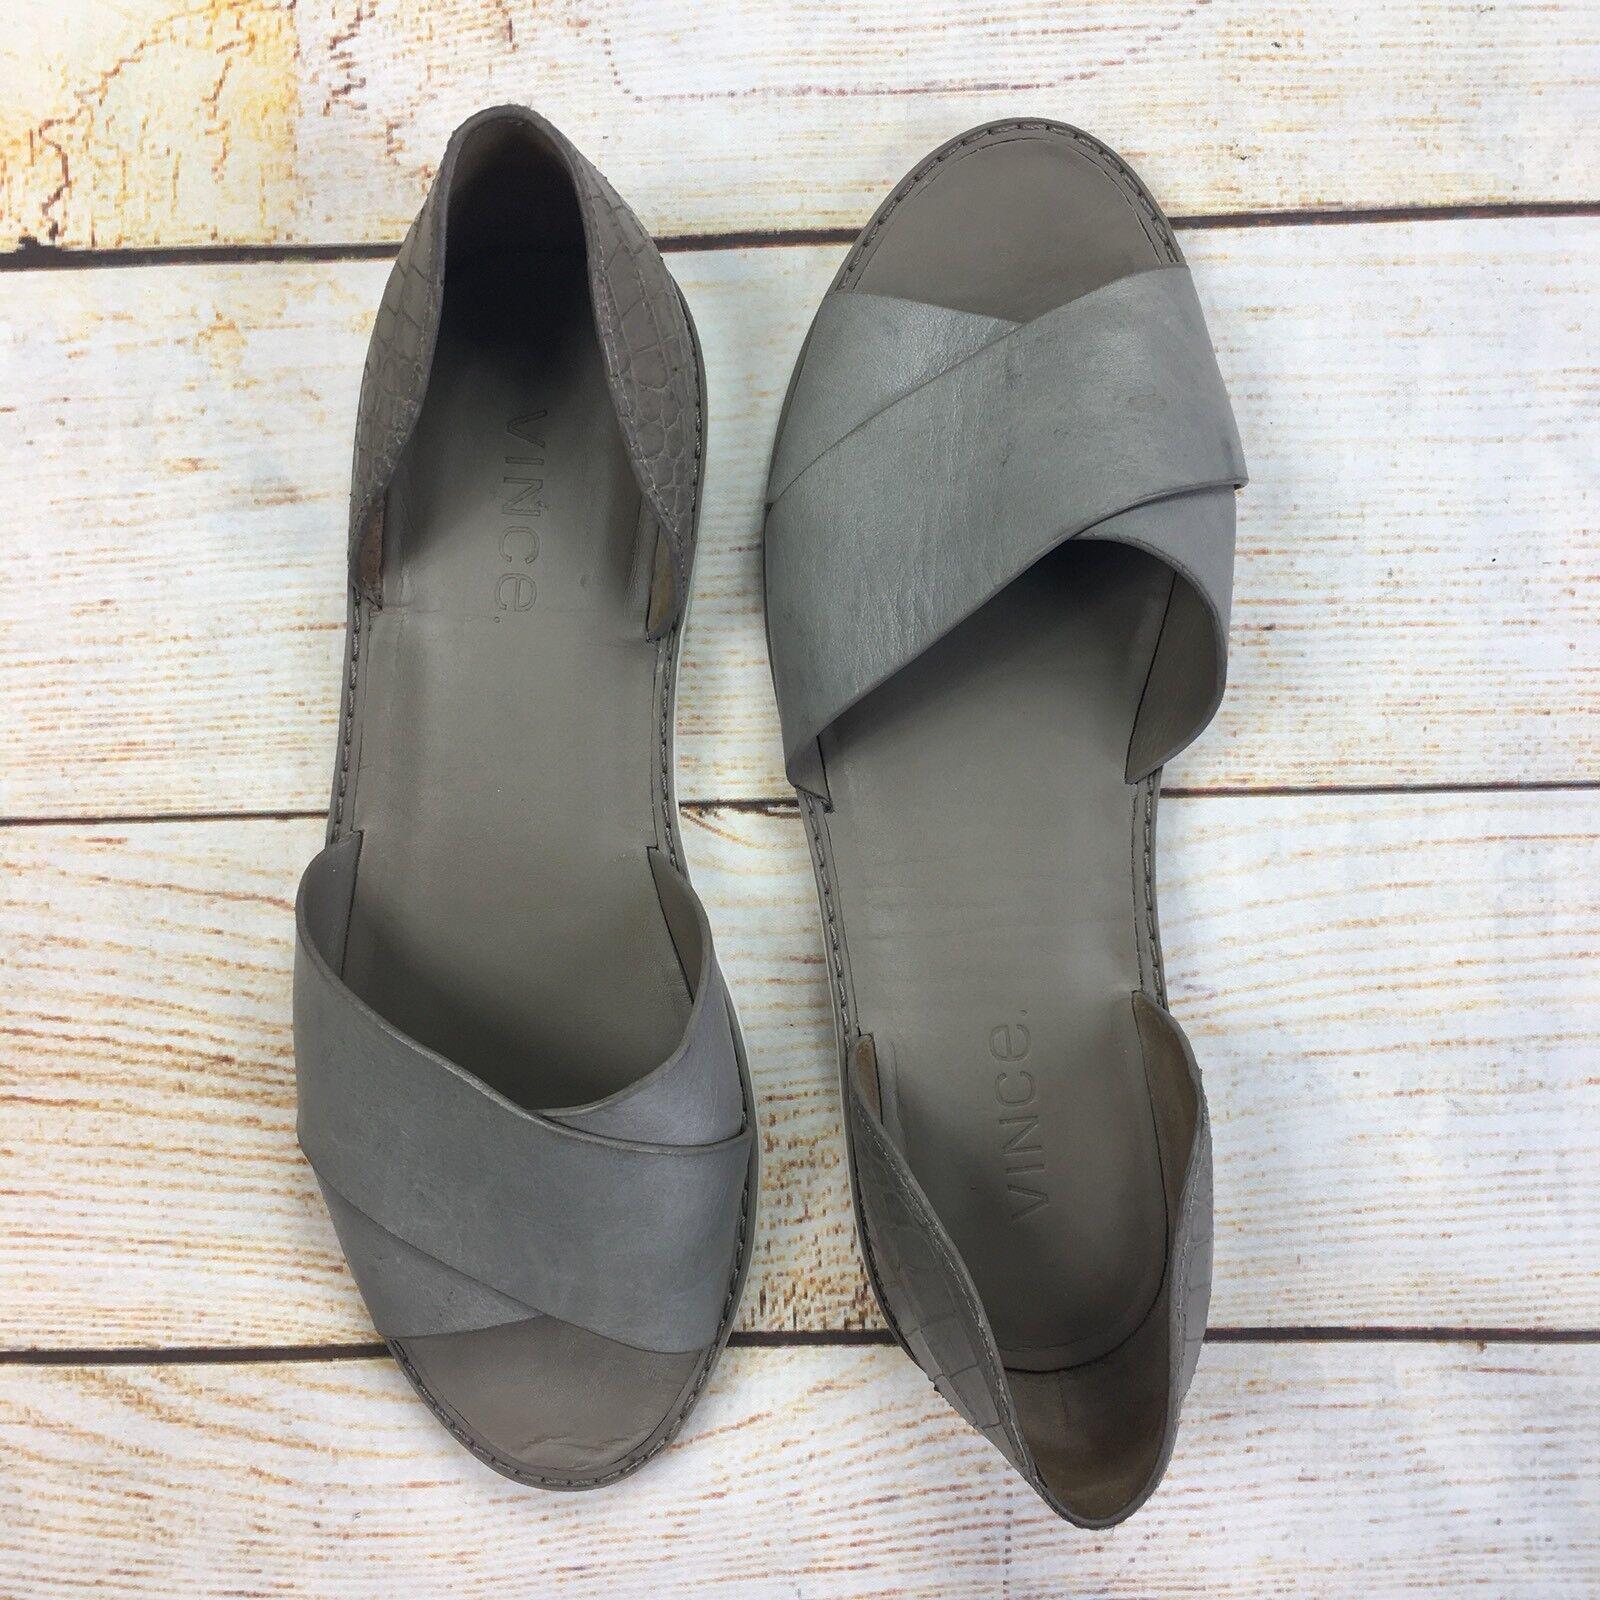 Vince Ida Open Toe Cross Strap Flat Sandale Gray Leder Croc Embossed Größe 8